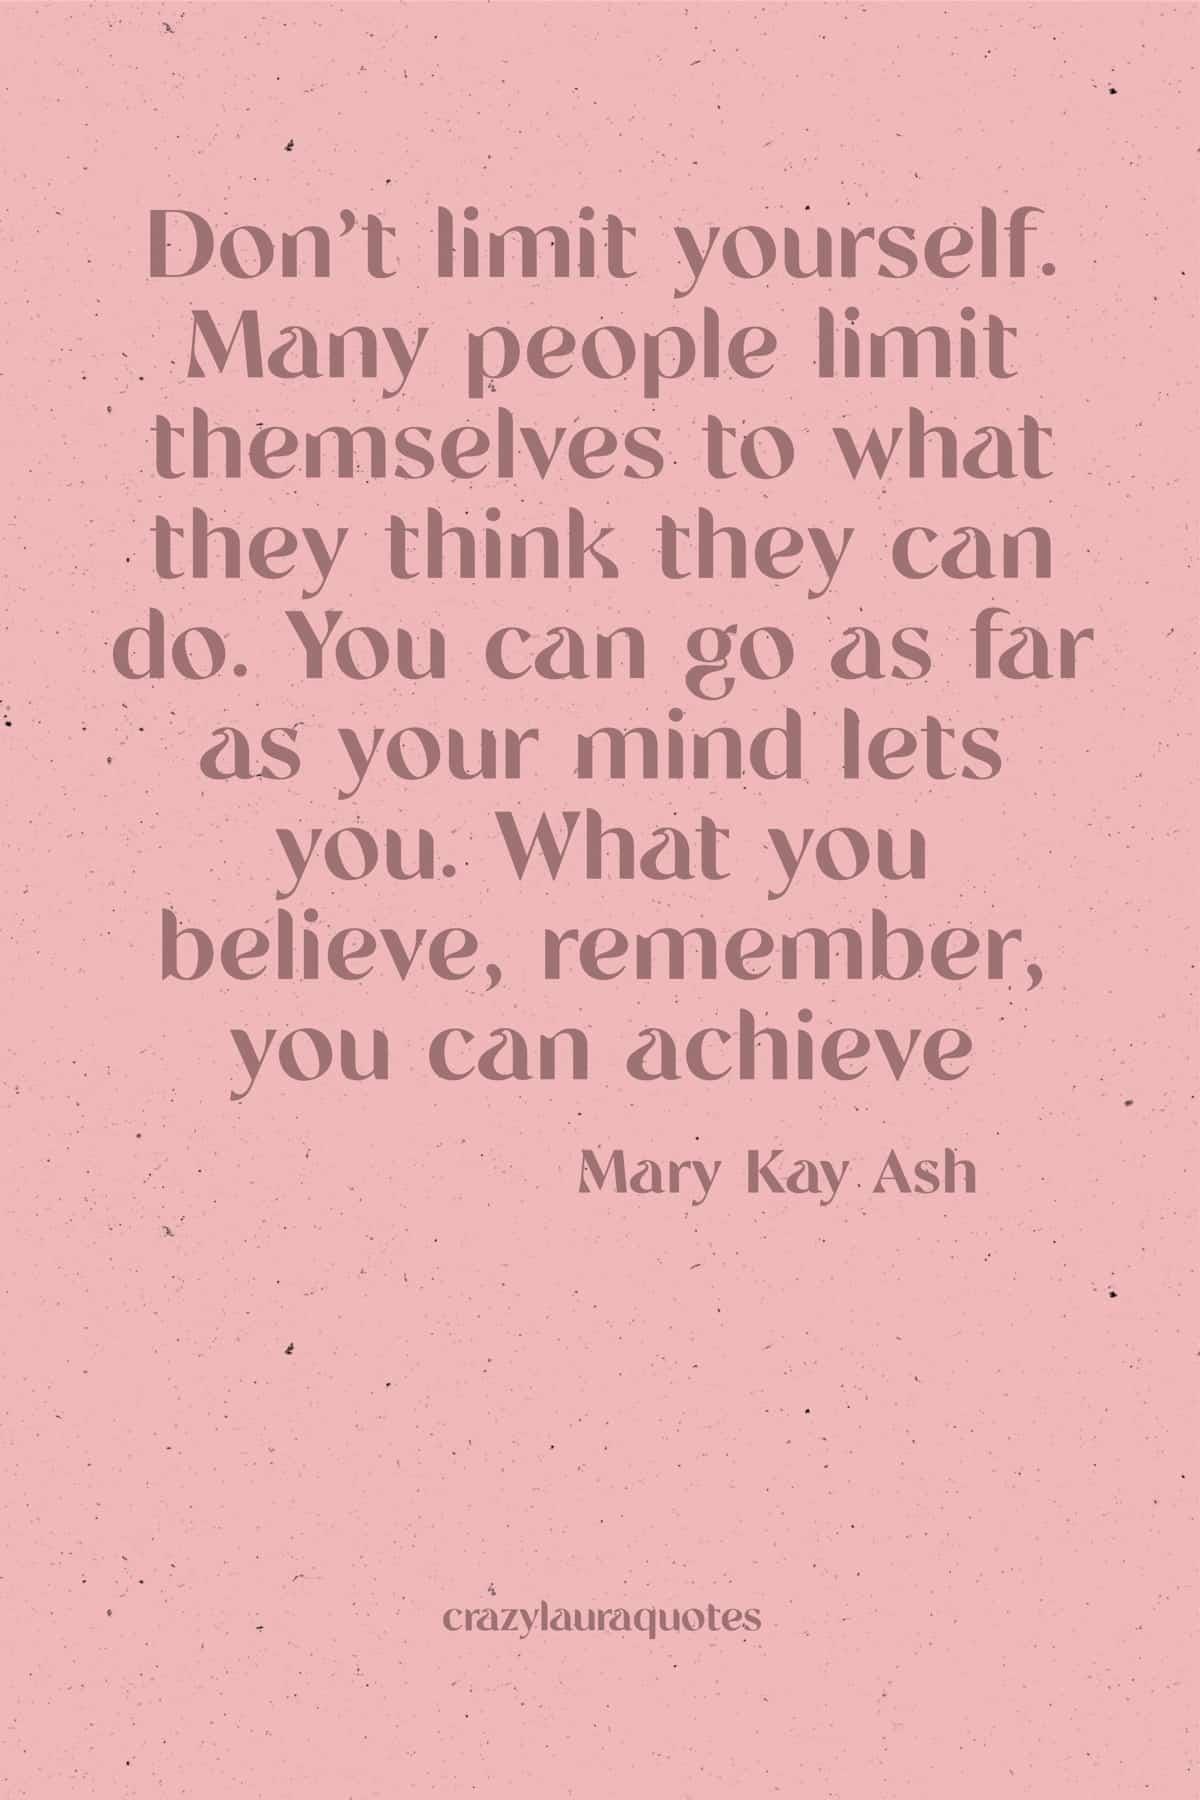 best monday motivational quotes